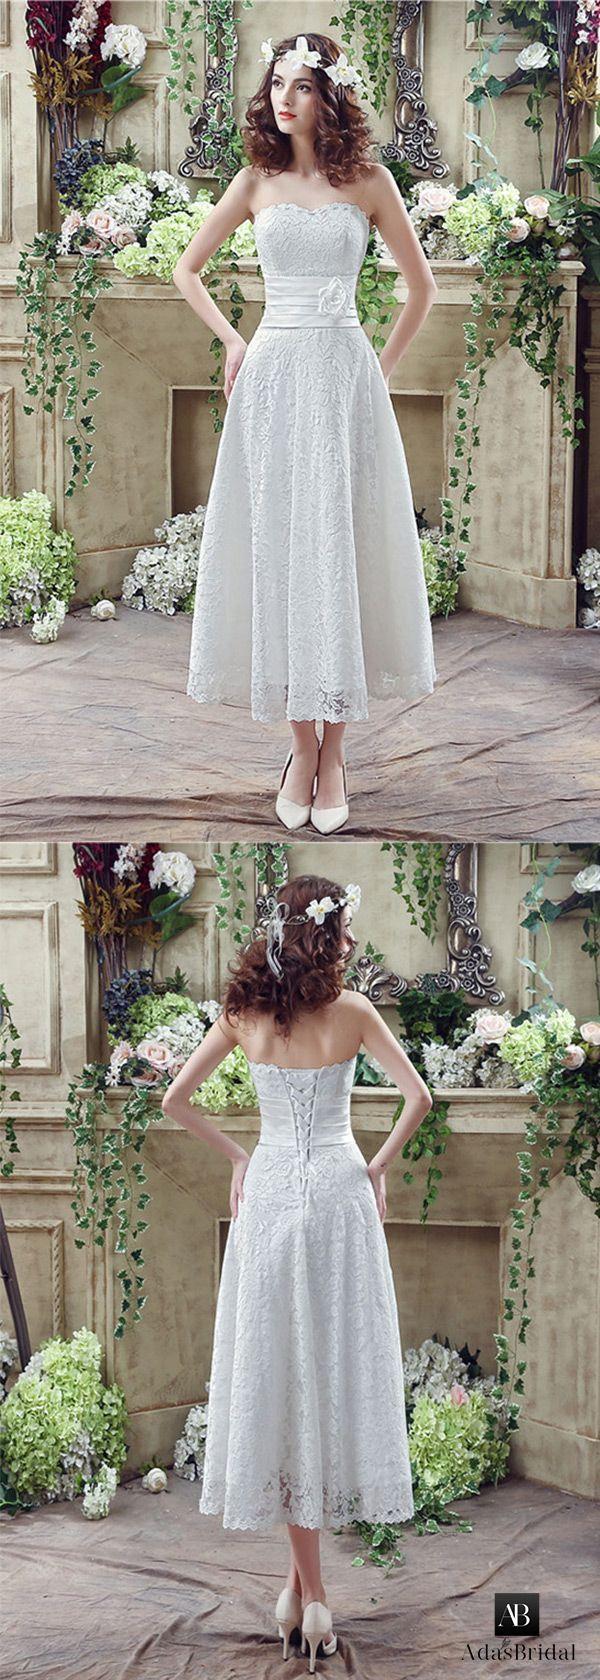 Best Aline Wedding Dresses  In stock lace strapless aline tea